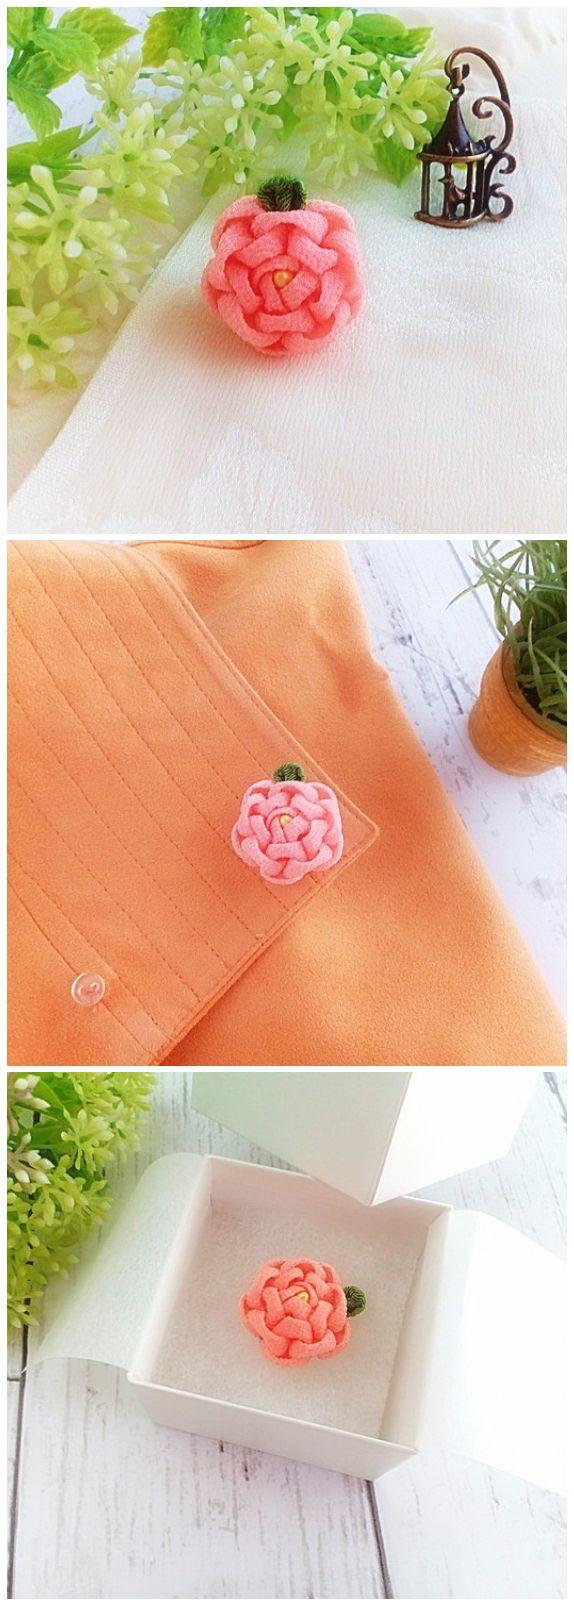 Pink Camellia Kanzashi Flower Lapel Pin Flower Tie Tack Pin  #etsyfinds #etsyaccessories #lapelpin #tietackpin #hatpin #flowerlapelpin #weddingboutonniere #handmadeaccessory #flowerpin #flowerbrooch #giftideas #giftforher #giftforhim #mothersgift #fathersgift #kanzashi #kanzashiflower #tsumamizaiku #camellias #pinkflower #pinklapelpin #fabricflower   #japanesekanzashi #buyhandmade #handmadewithlove